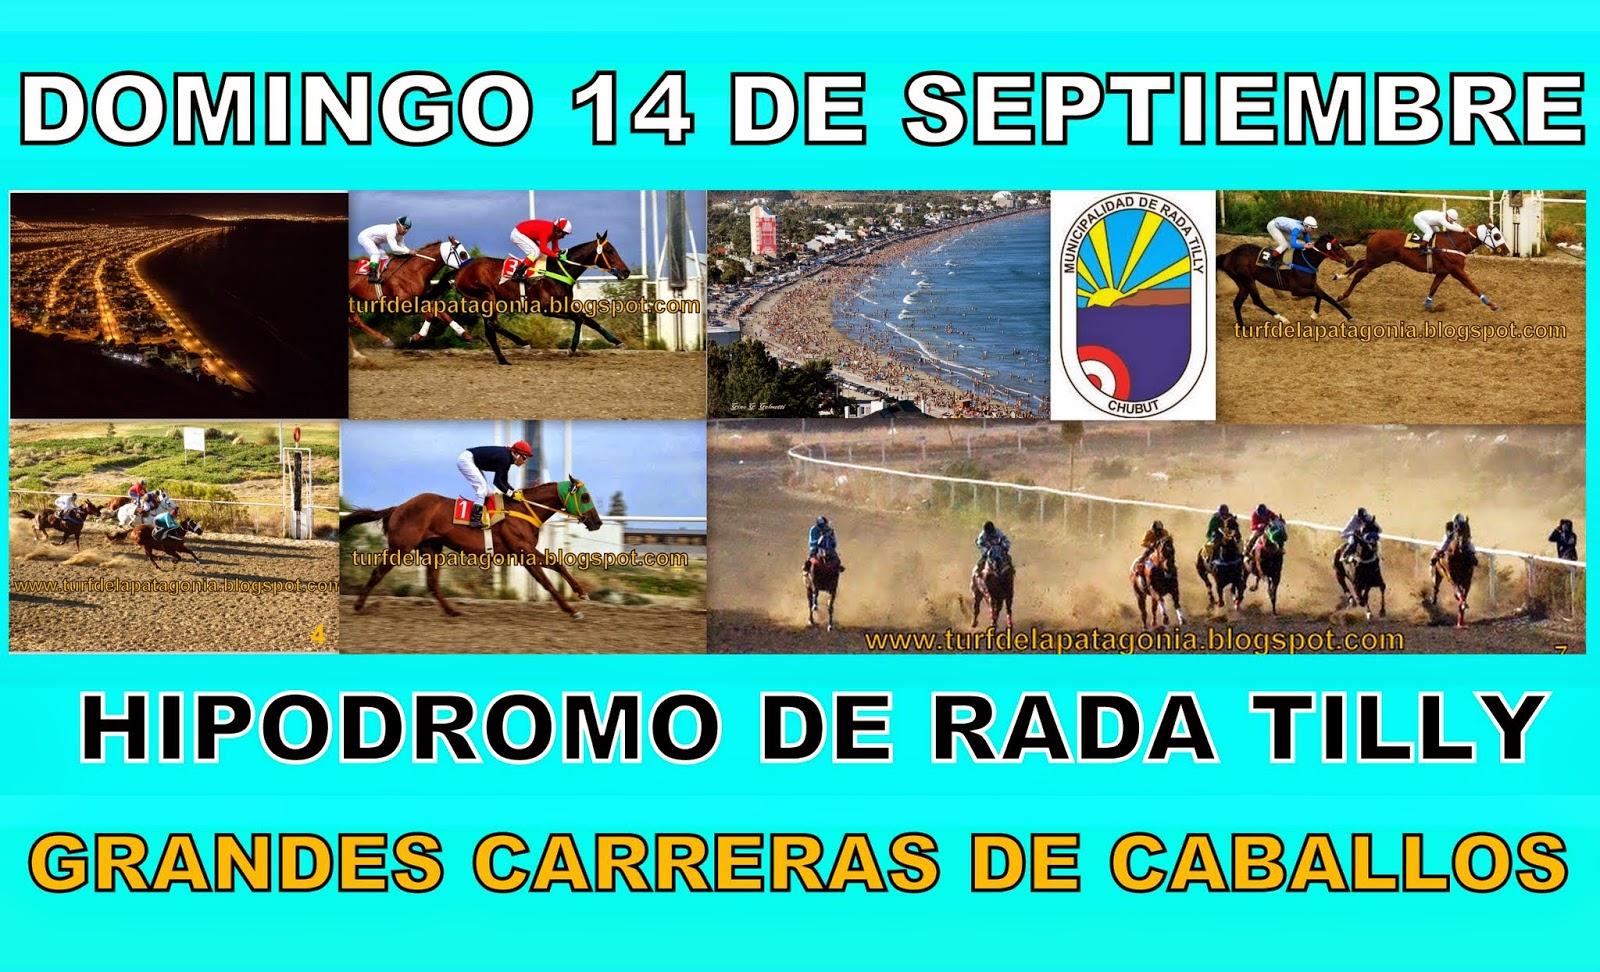 http://turfdelapatagonia.blogspot.com.ar/2014/09/1409-programa-de-carreras-de-caballos_62.html